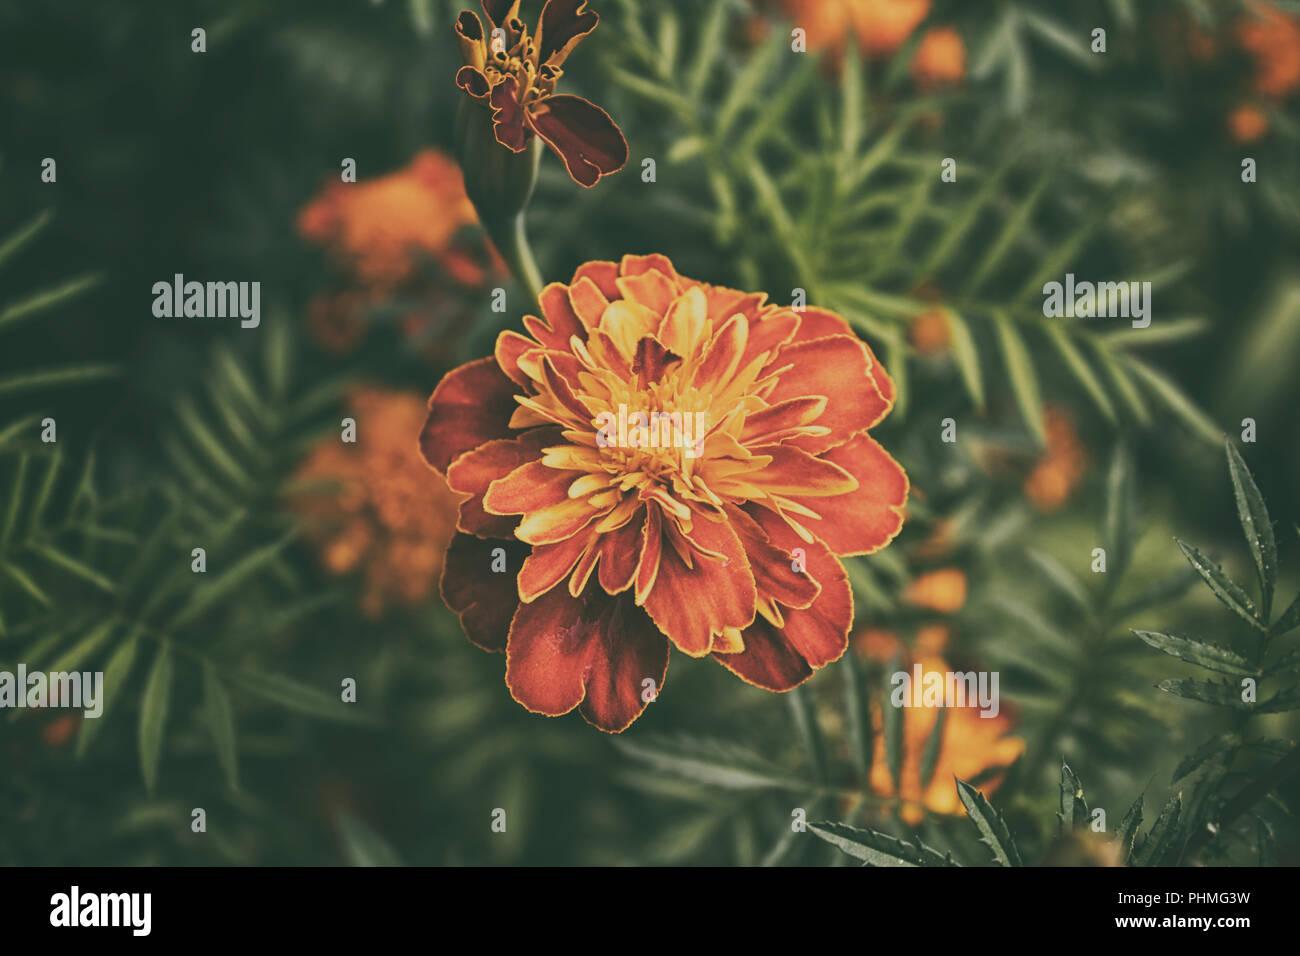 Marigold flower. Garden flowers. Yellow flower. Orange flower. Summer flower. Stock Photo